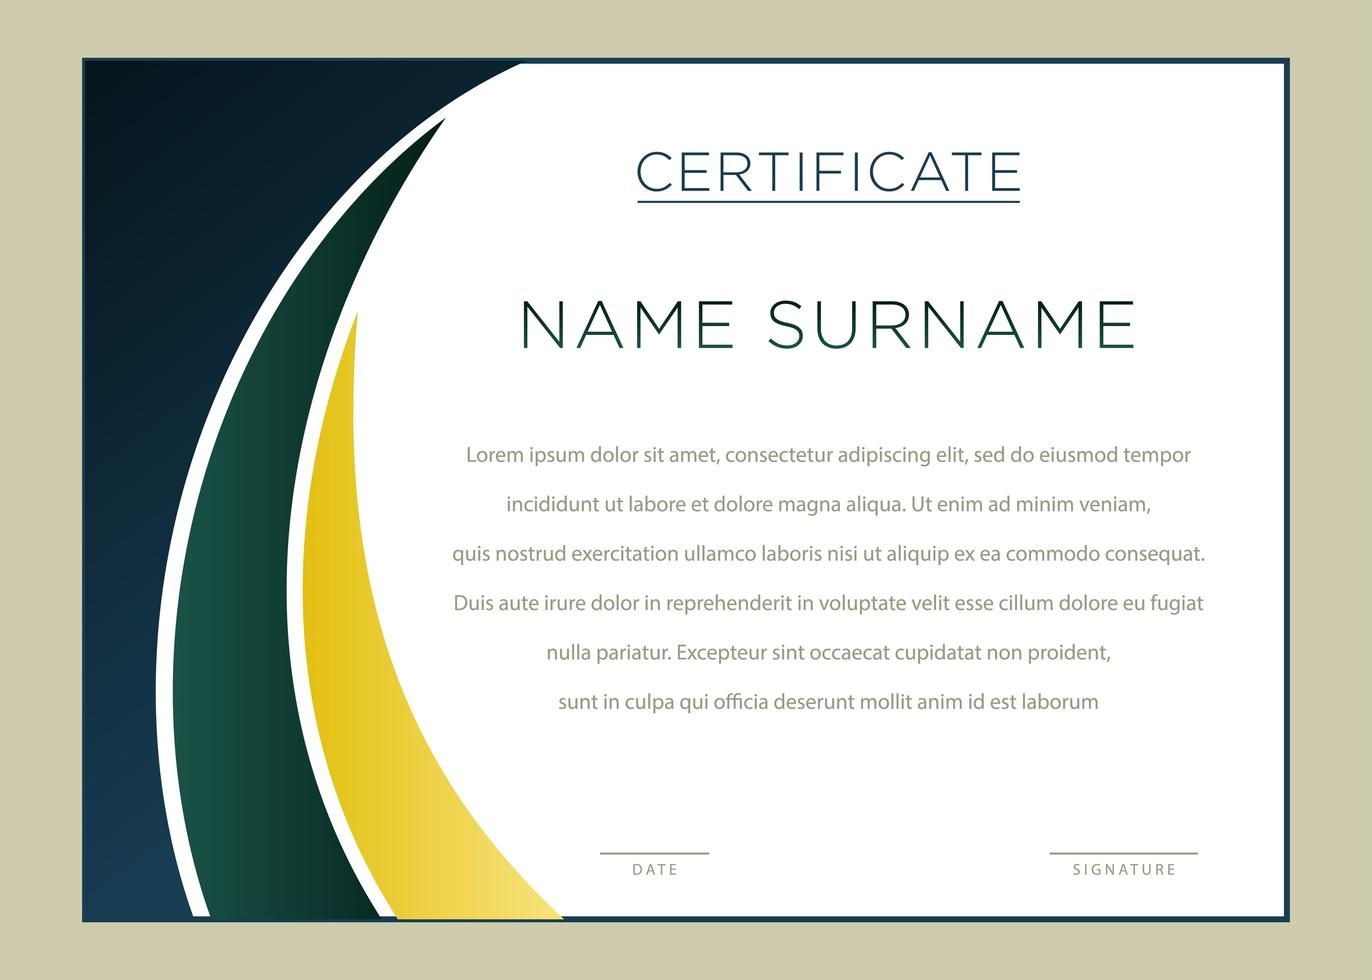 certificat de coin courbe dégradé horizontal vert et jaune vecteur